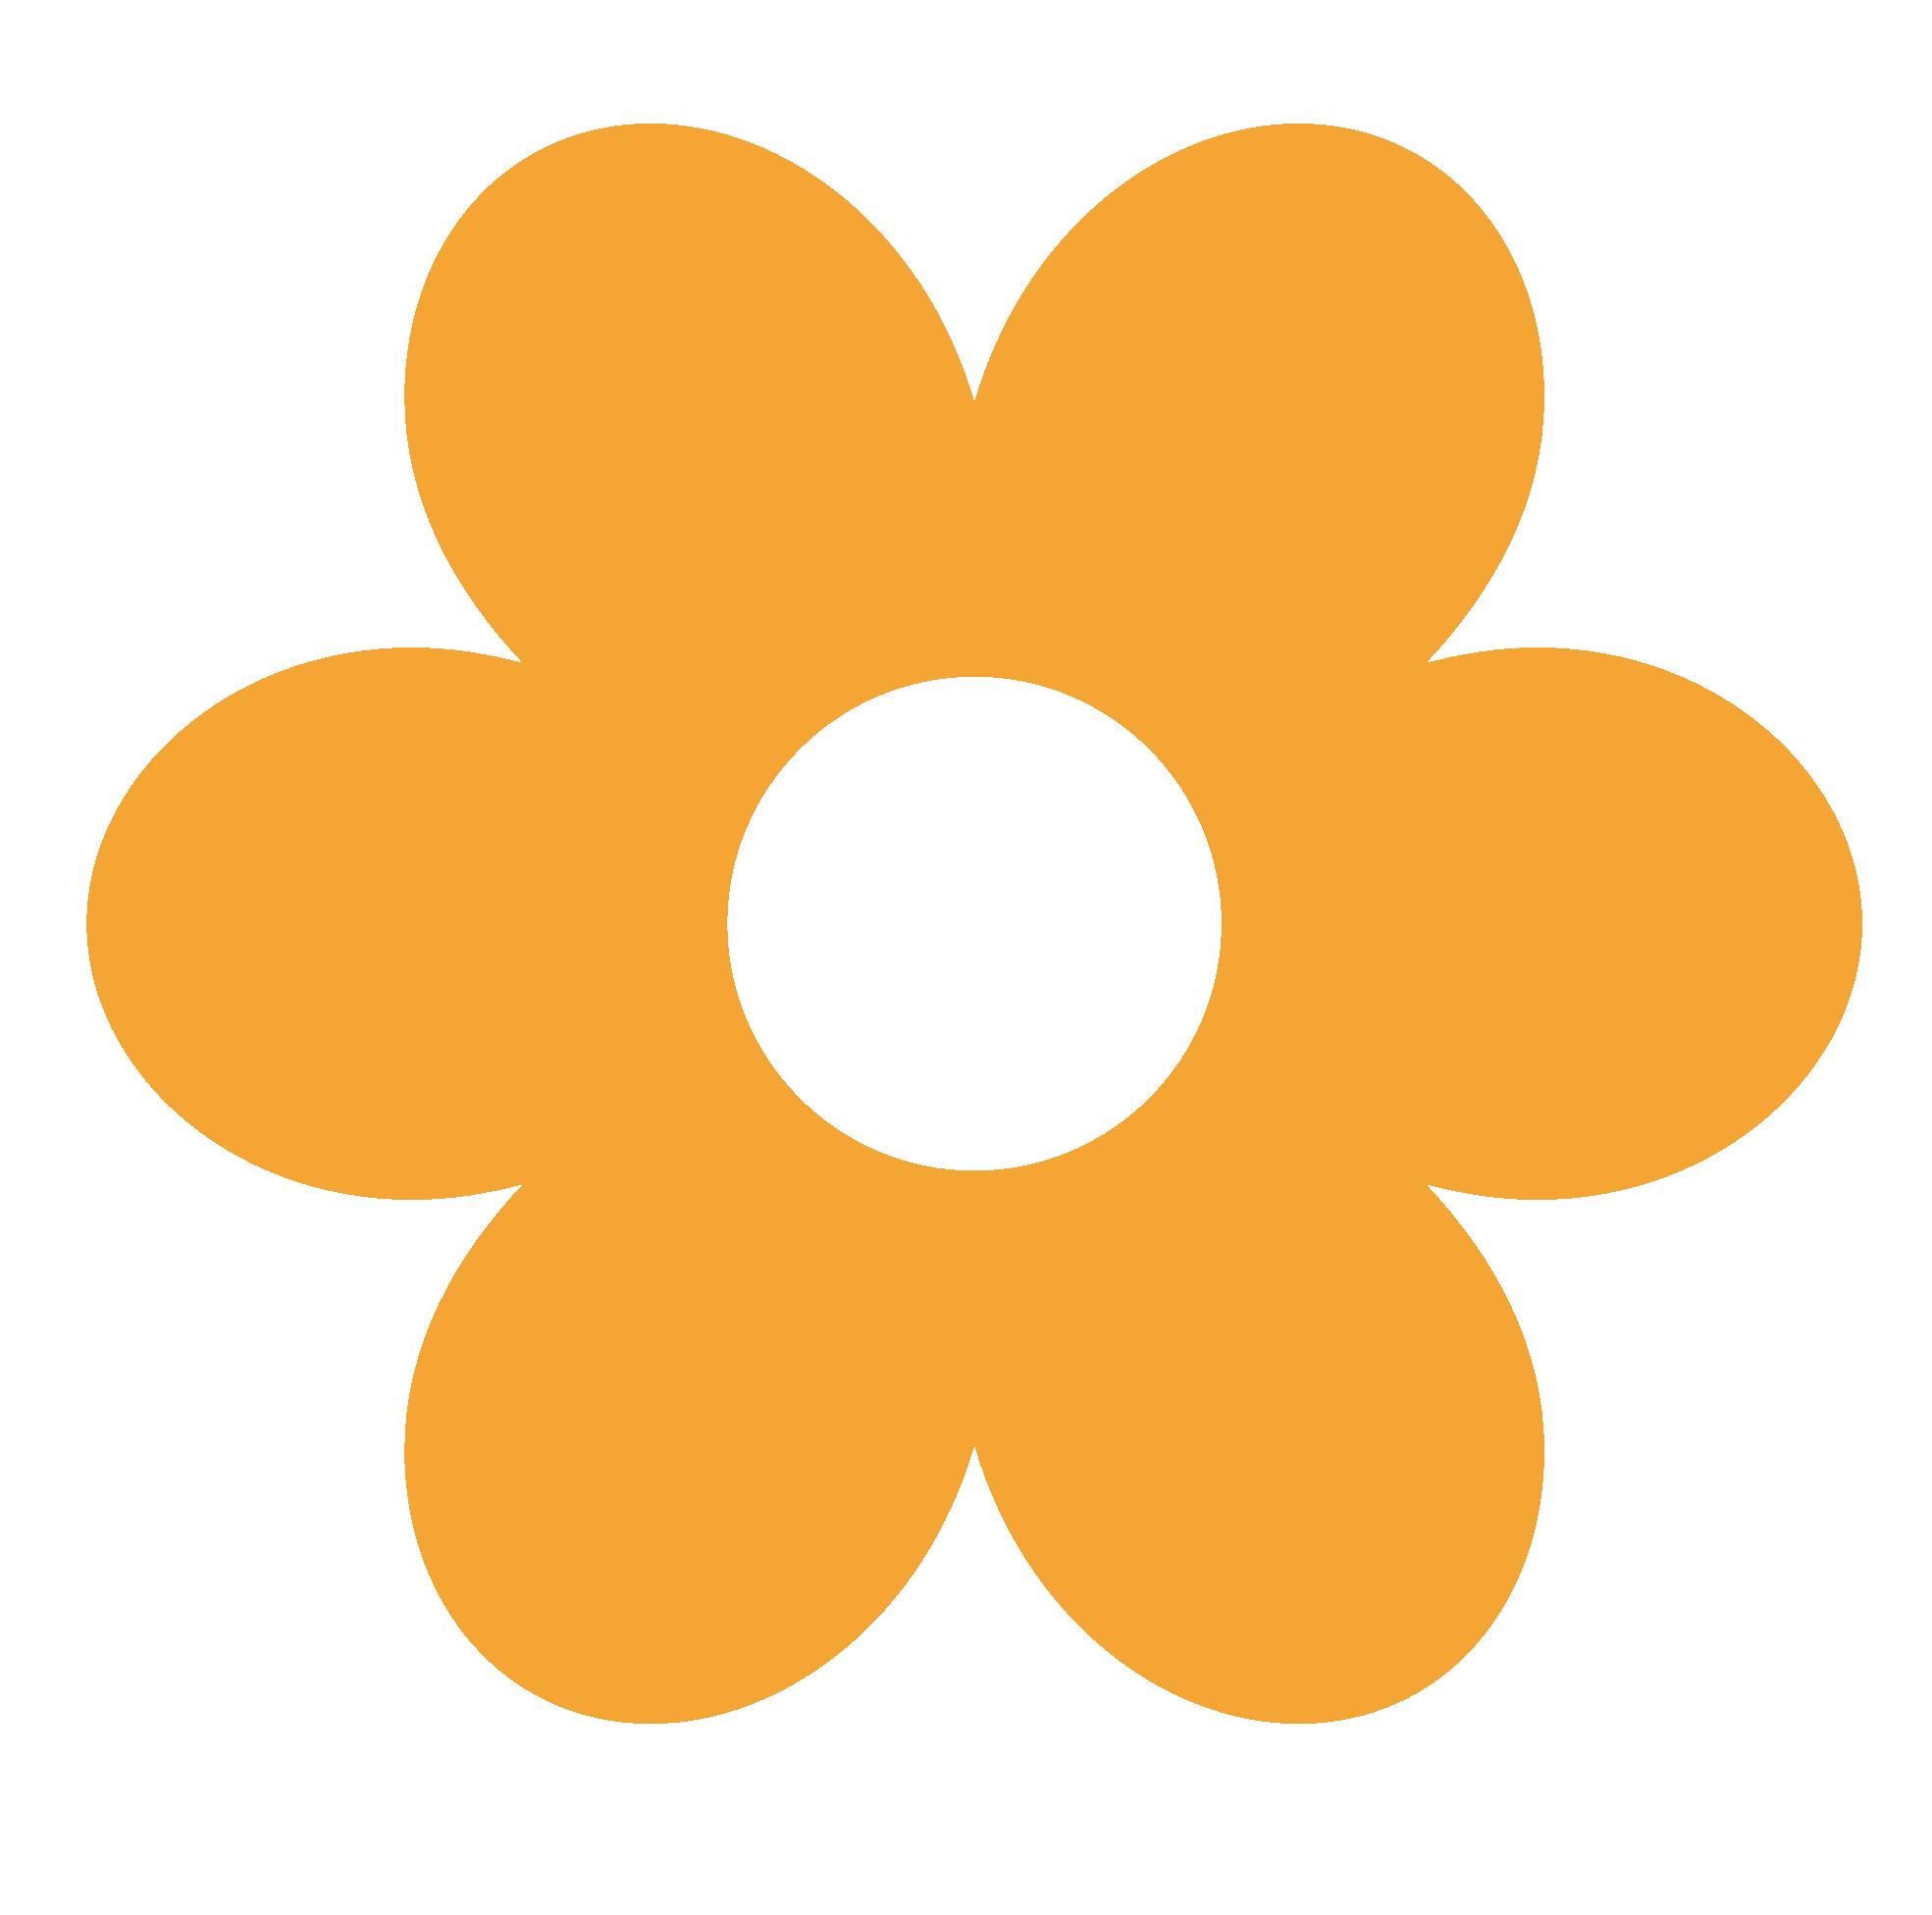 Yellow Flower clipart png format On Art Retro Art Flower